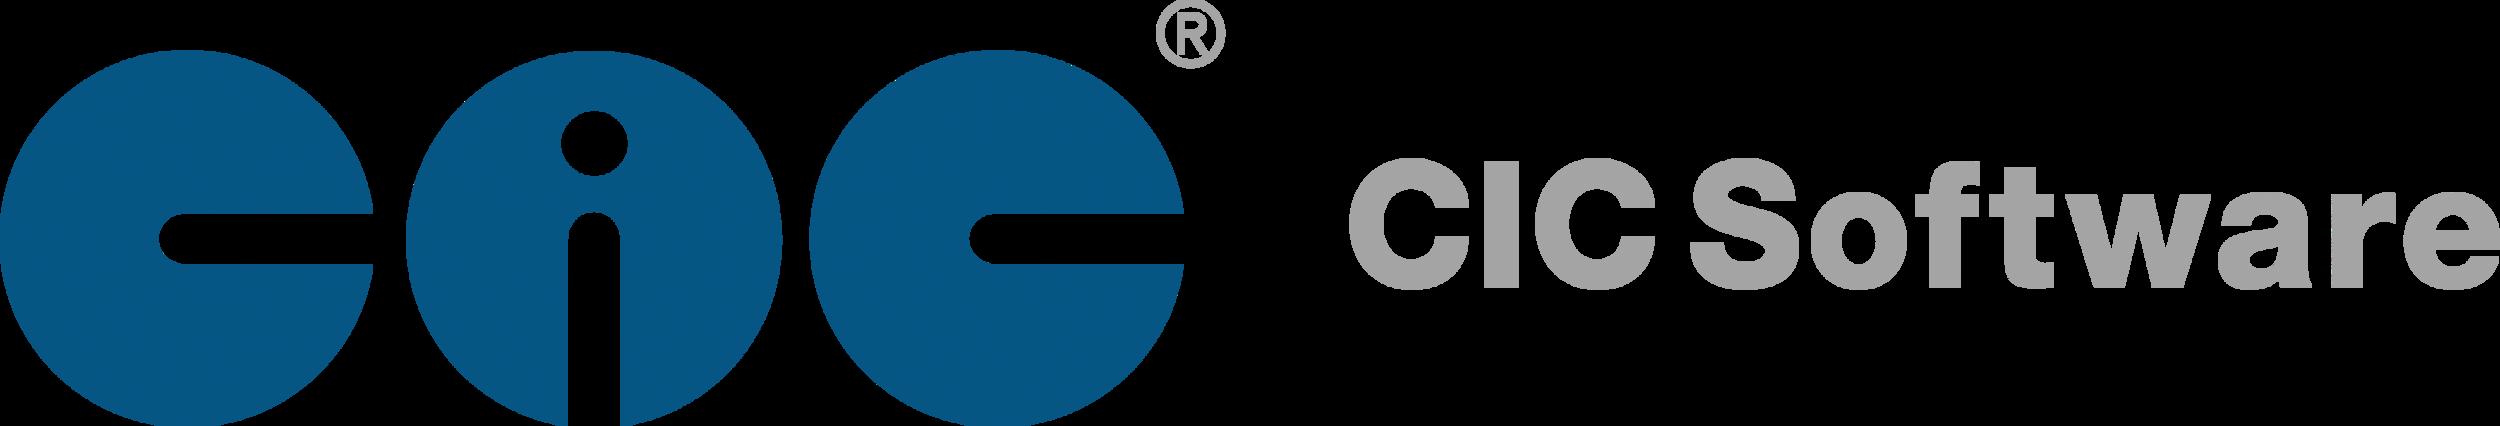 cic_logo_2011_rgb_transparent.png